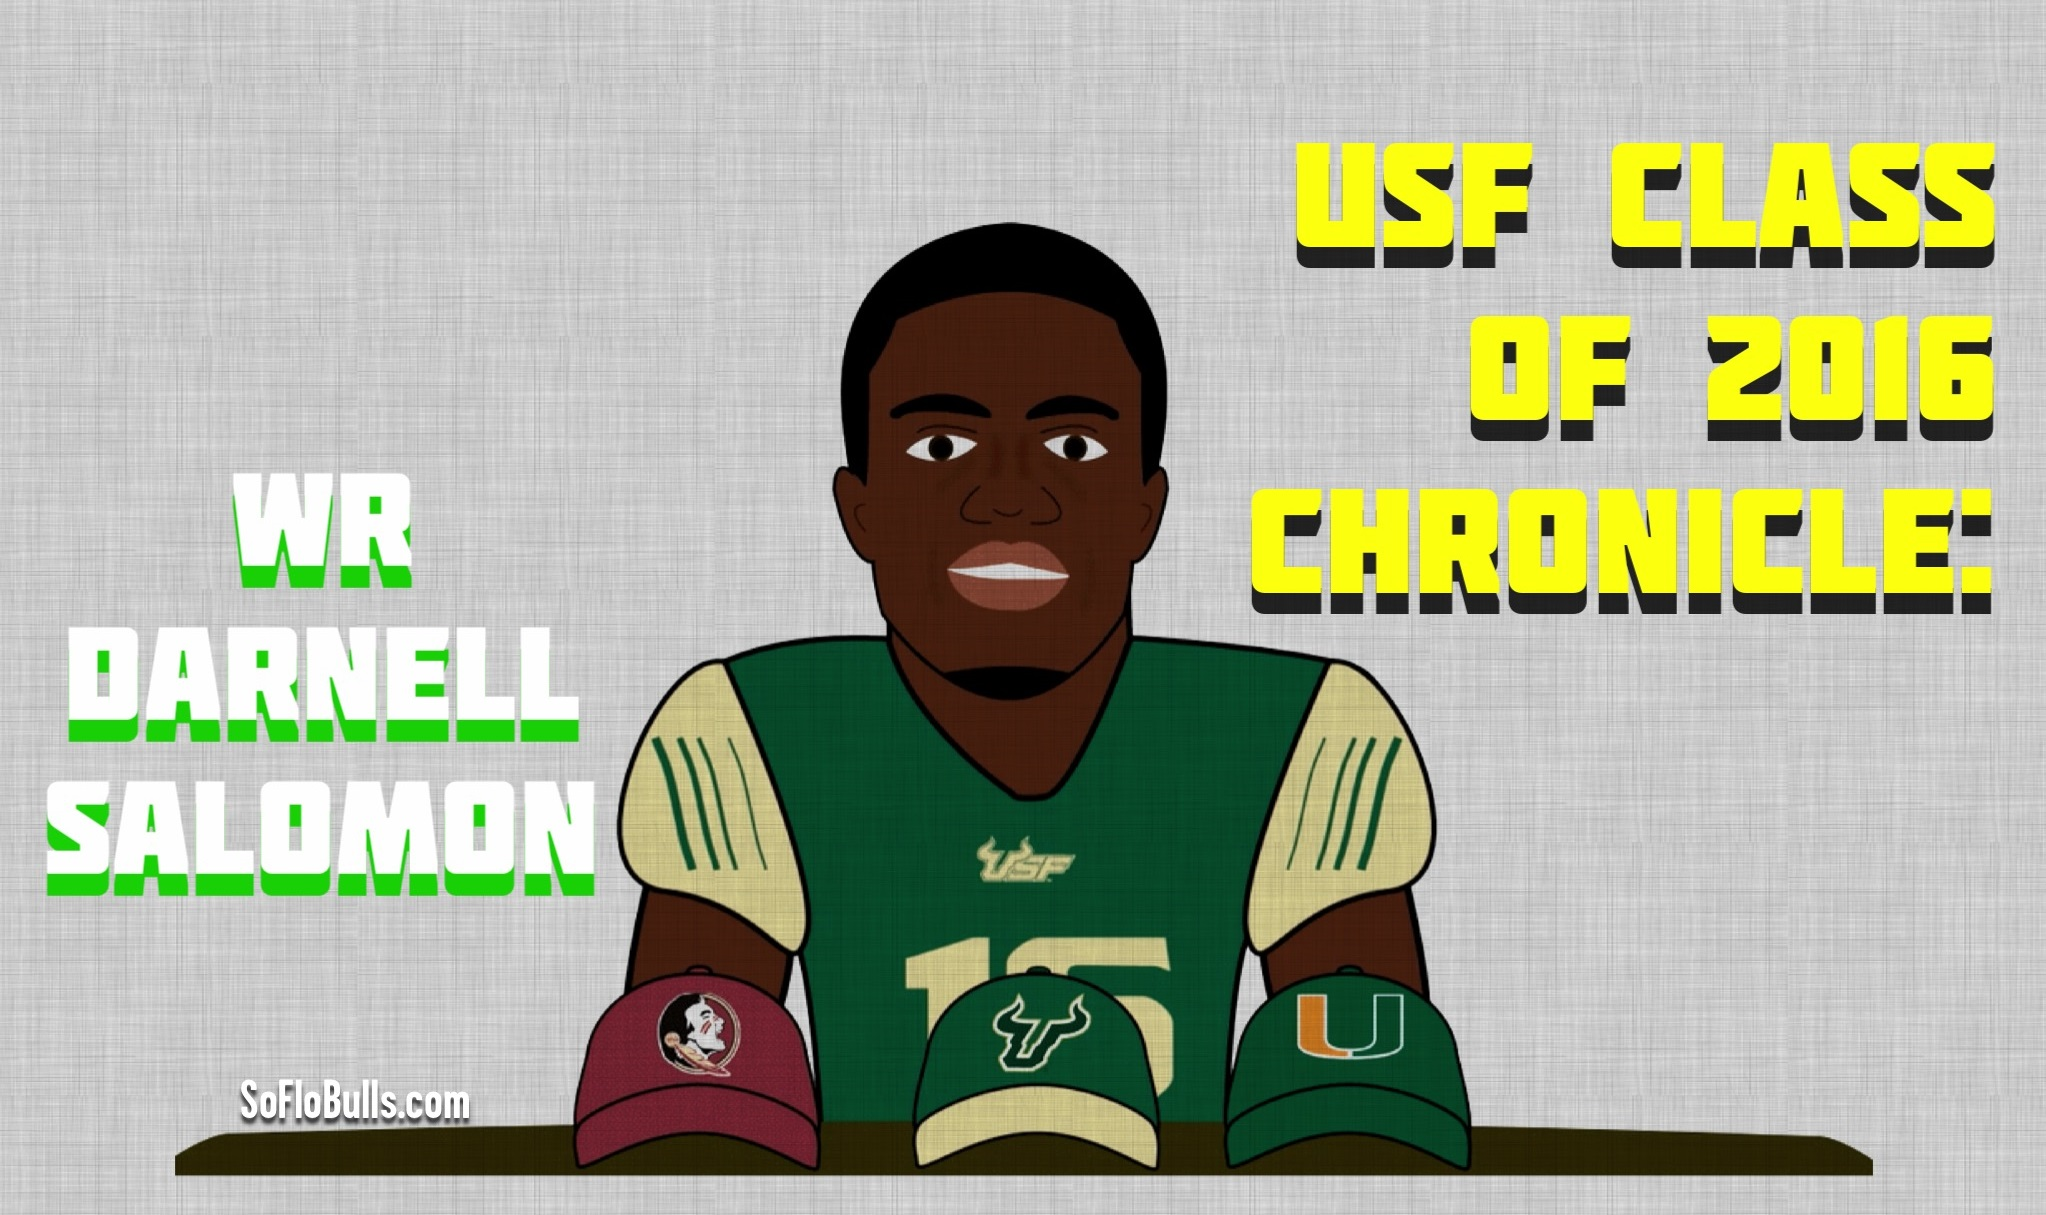 USF Class of 2016 Chronicle-WR Darnell Salomon by Matthew Manuri SoFloBulls.com (2046x1215)